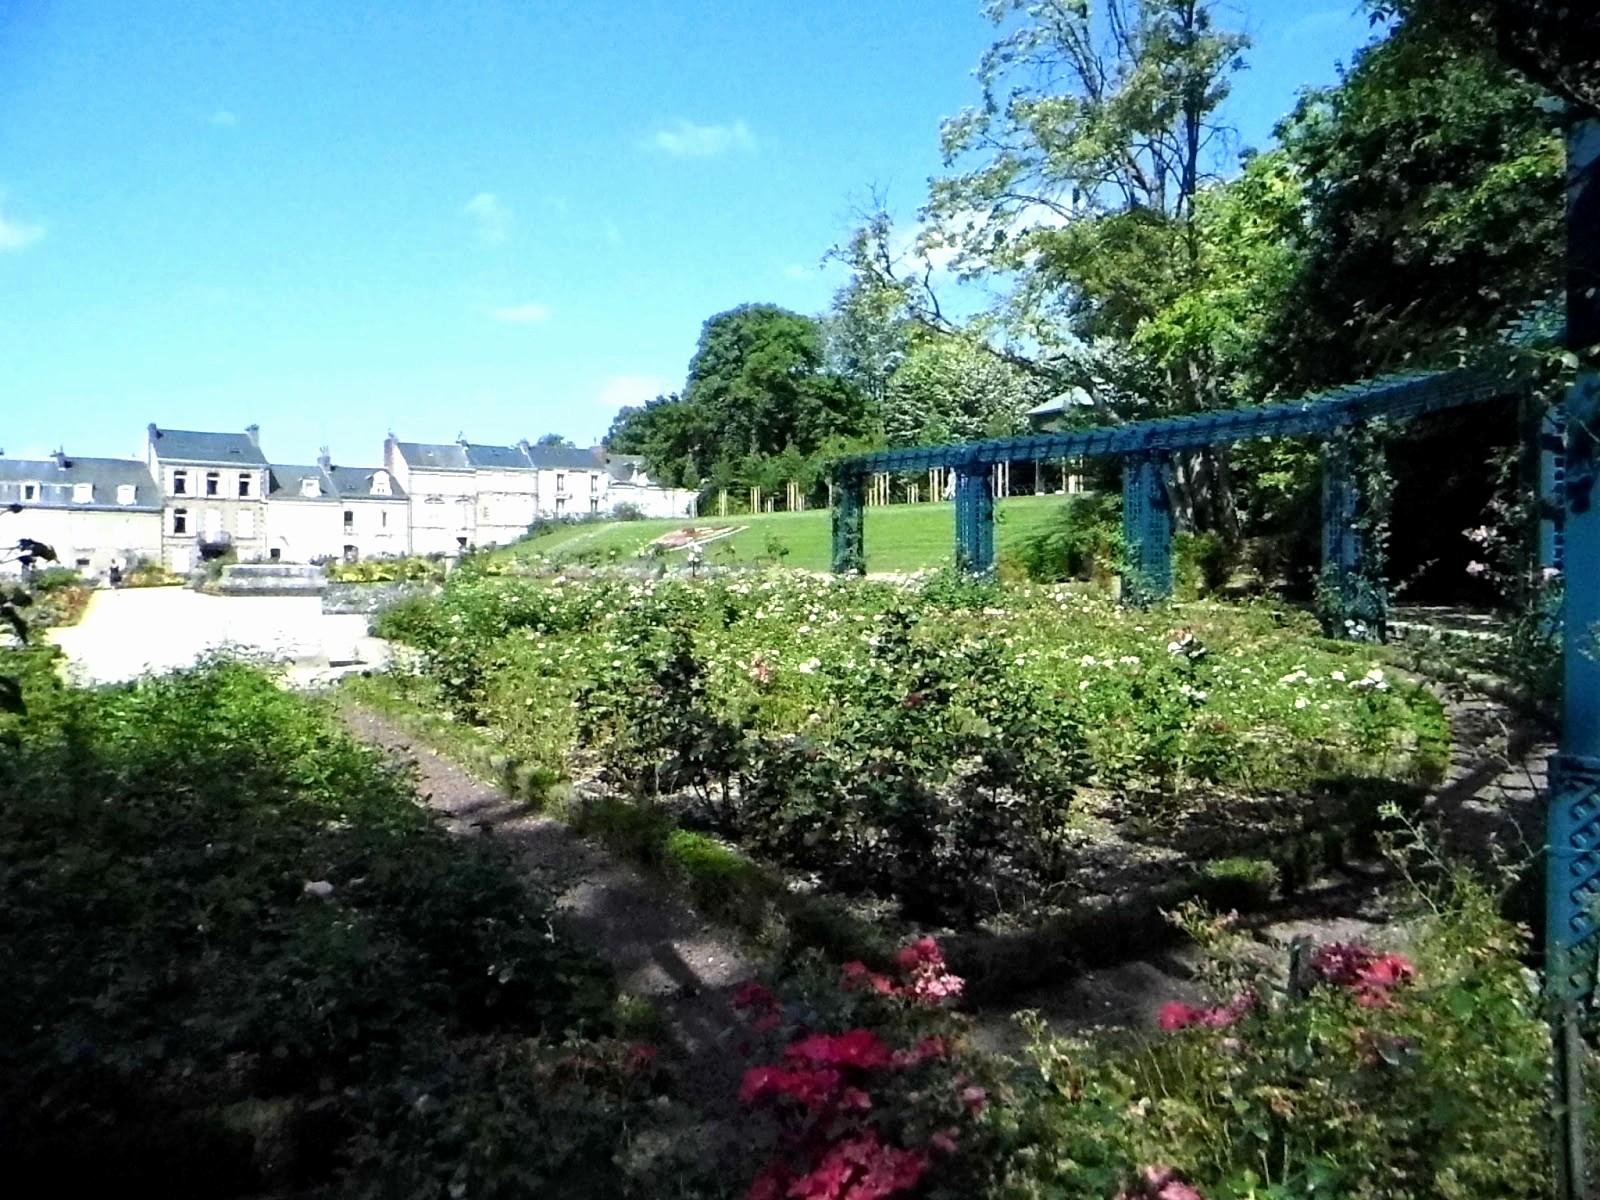 Le Jardin Des Sens Hennebont Impressionnant Stock Au Jardin New ¢‹†…¡ Conception De Jardin Au Jardin Inspirant Cloture